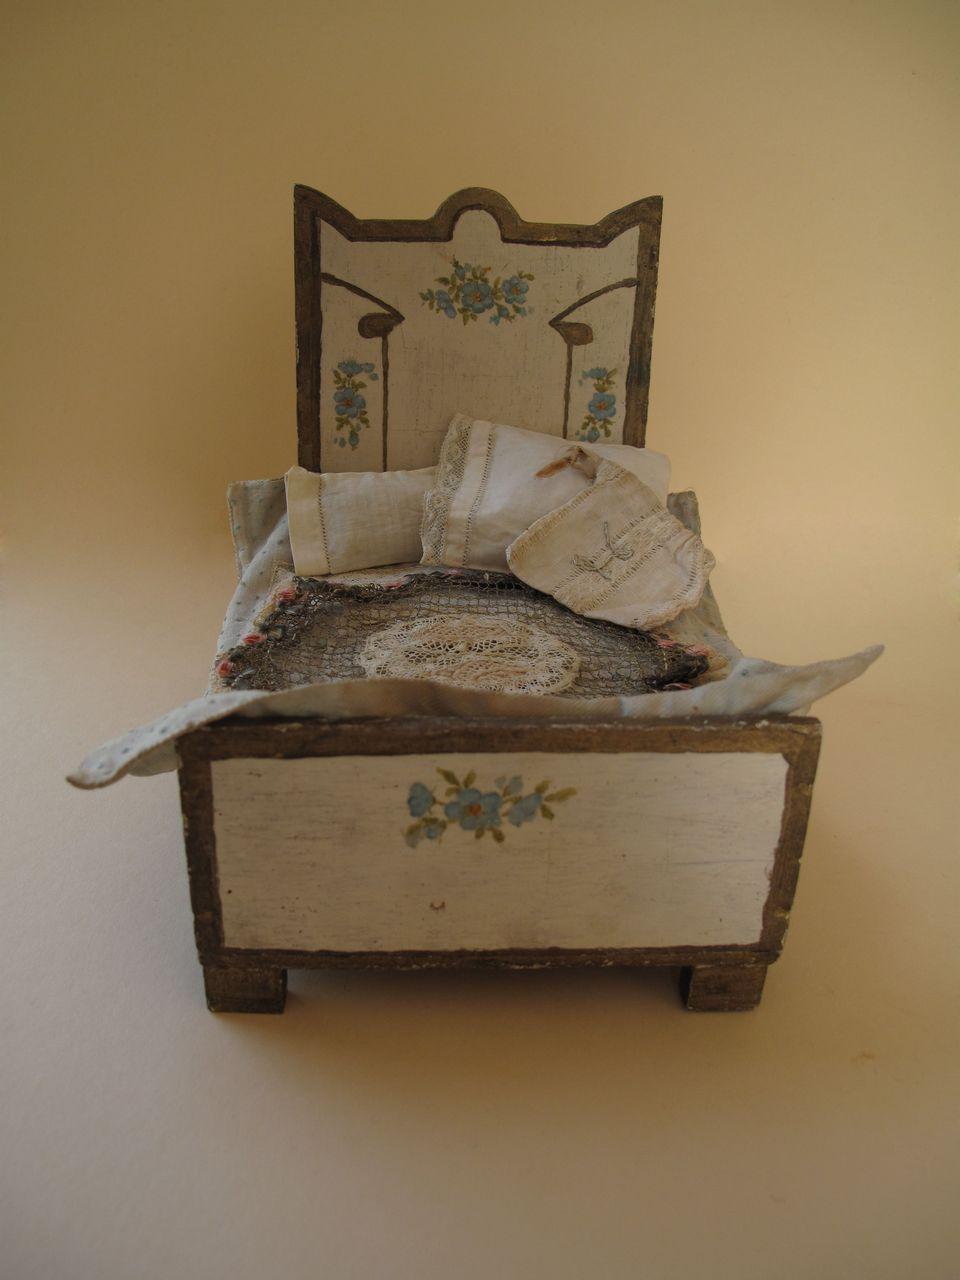 Miniature Handpainted Bed